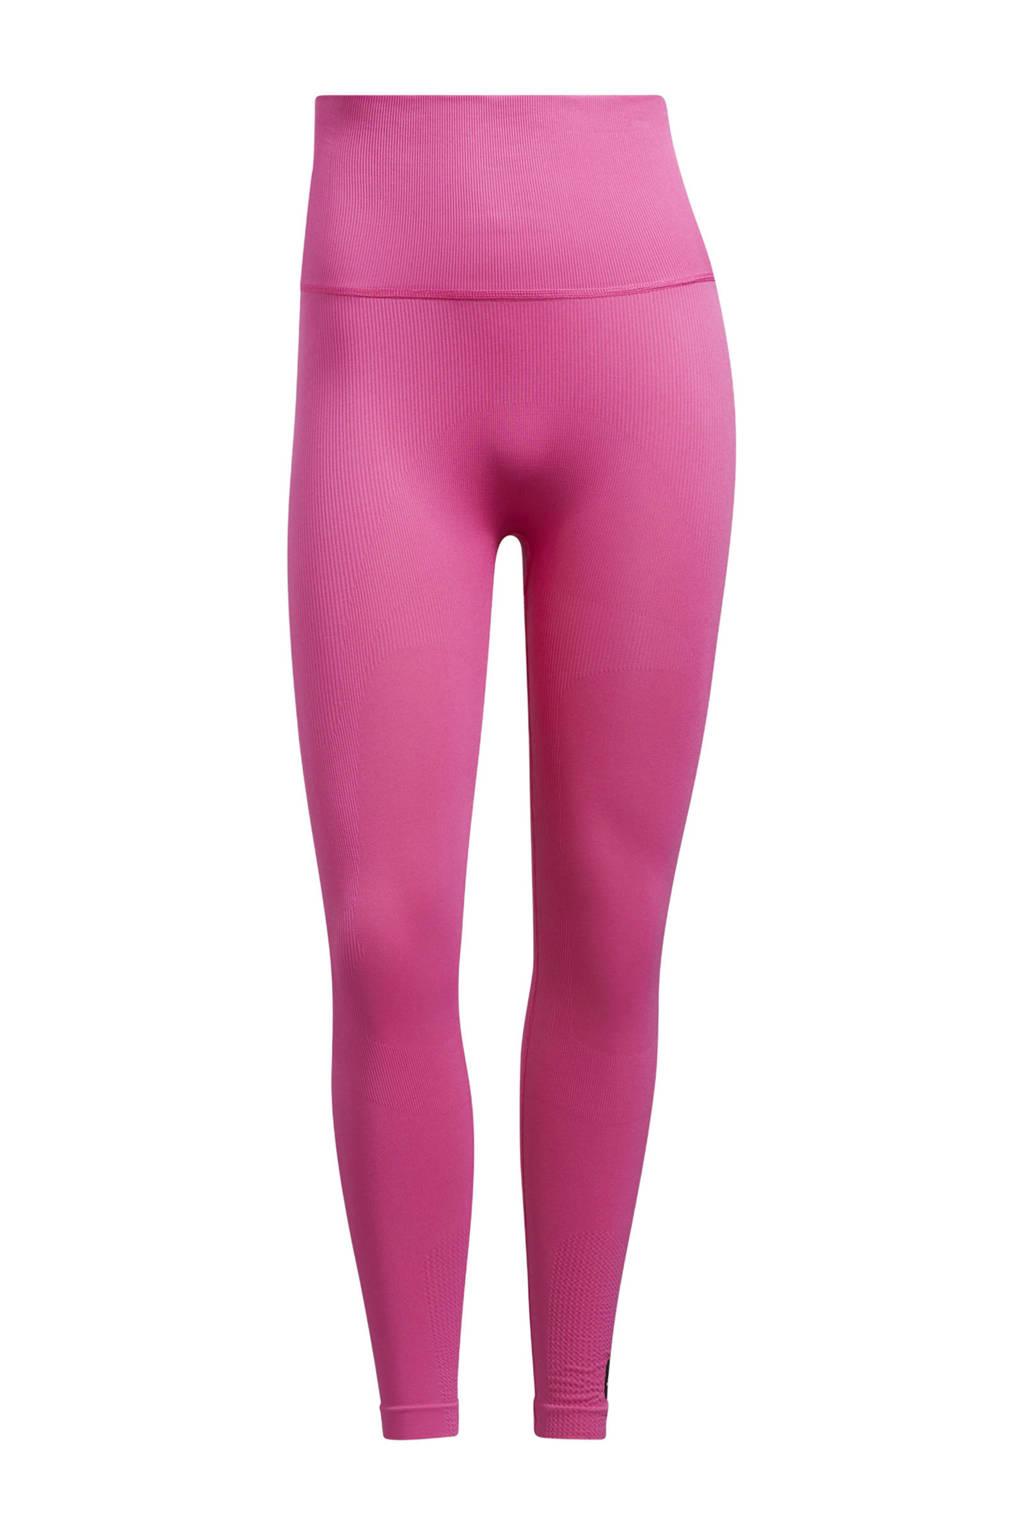 adidas Performance sportlegging roze, Roze